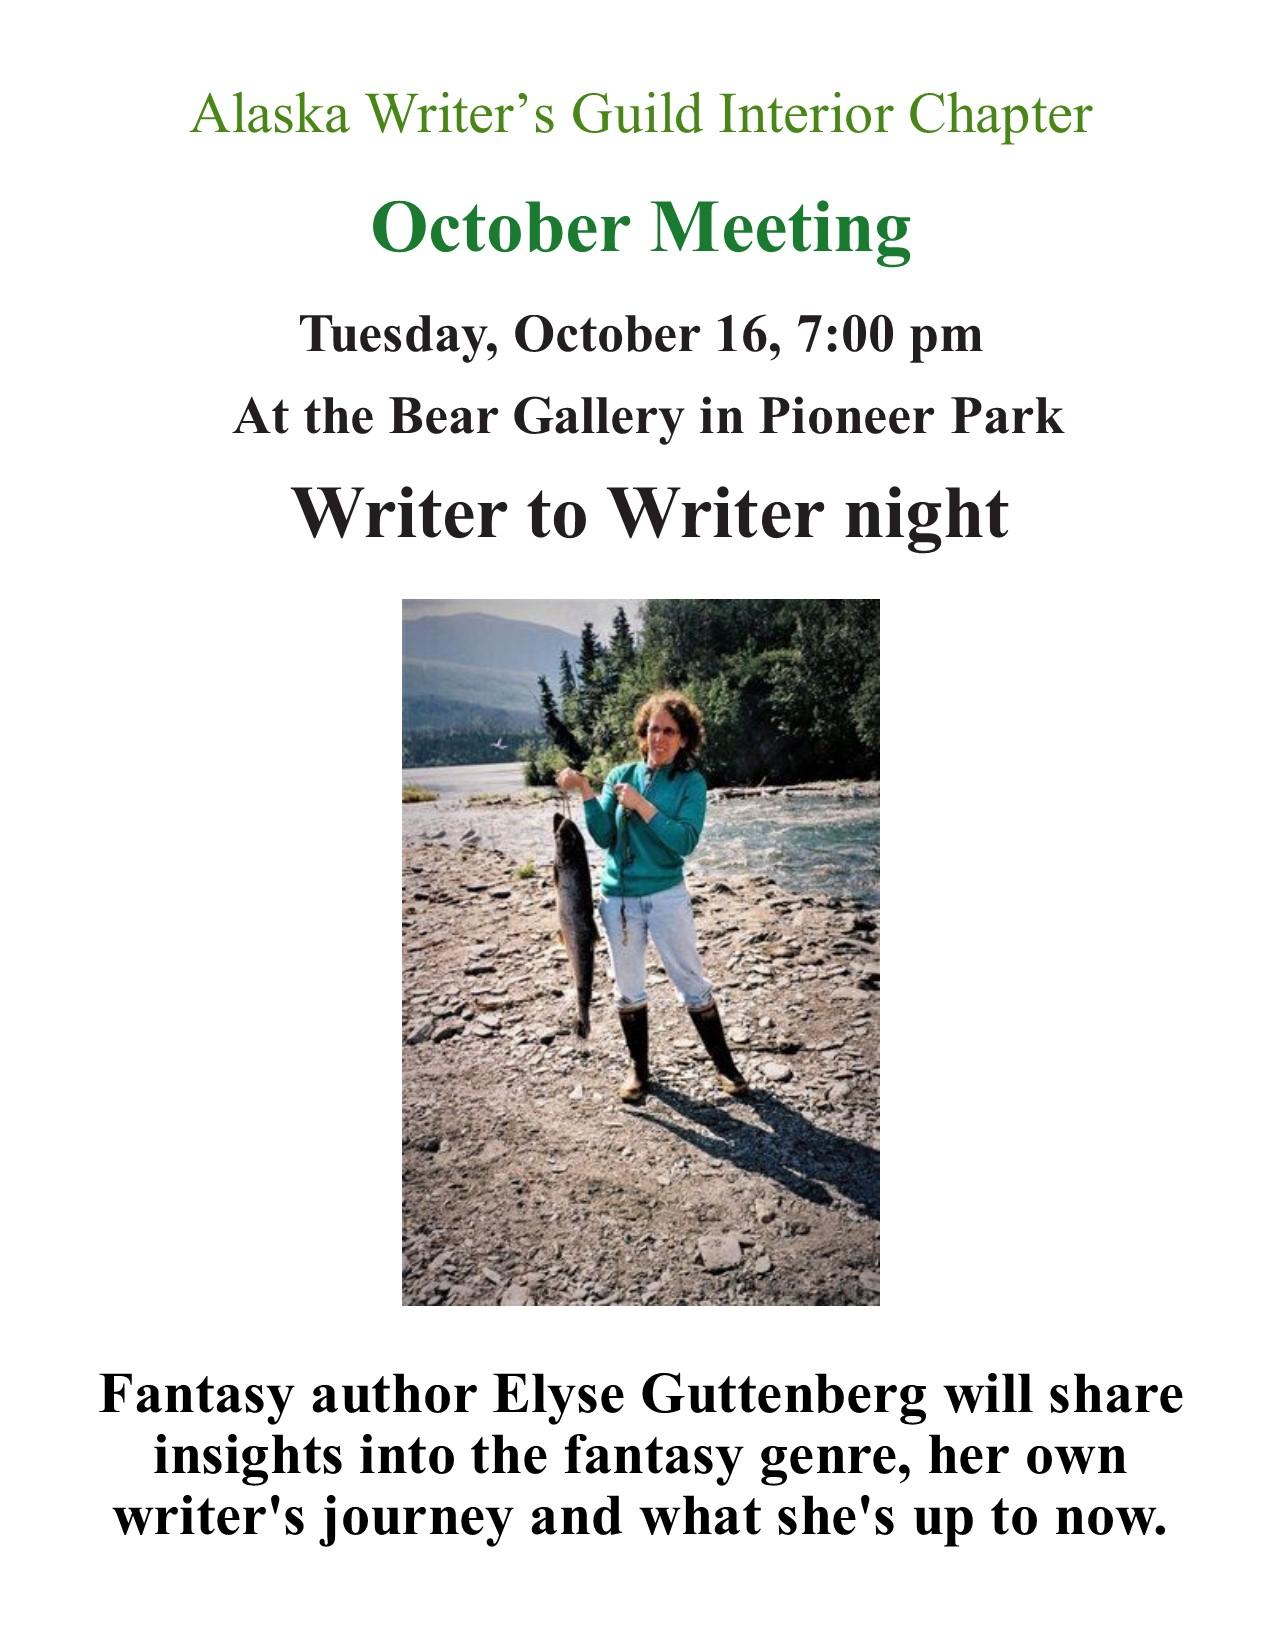 Elyse October 2018 Interior Writers Guild Guest Speaker.jpg